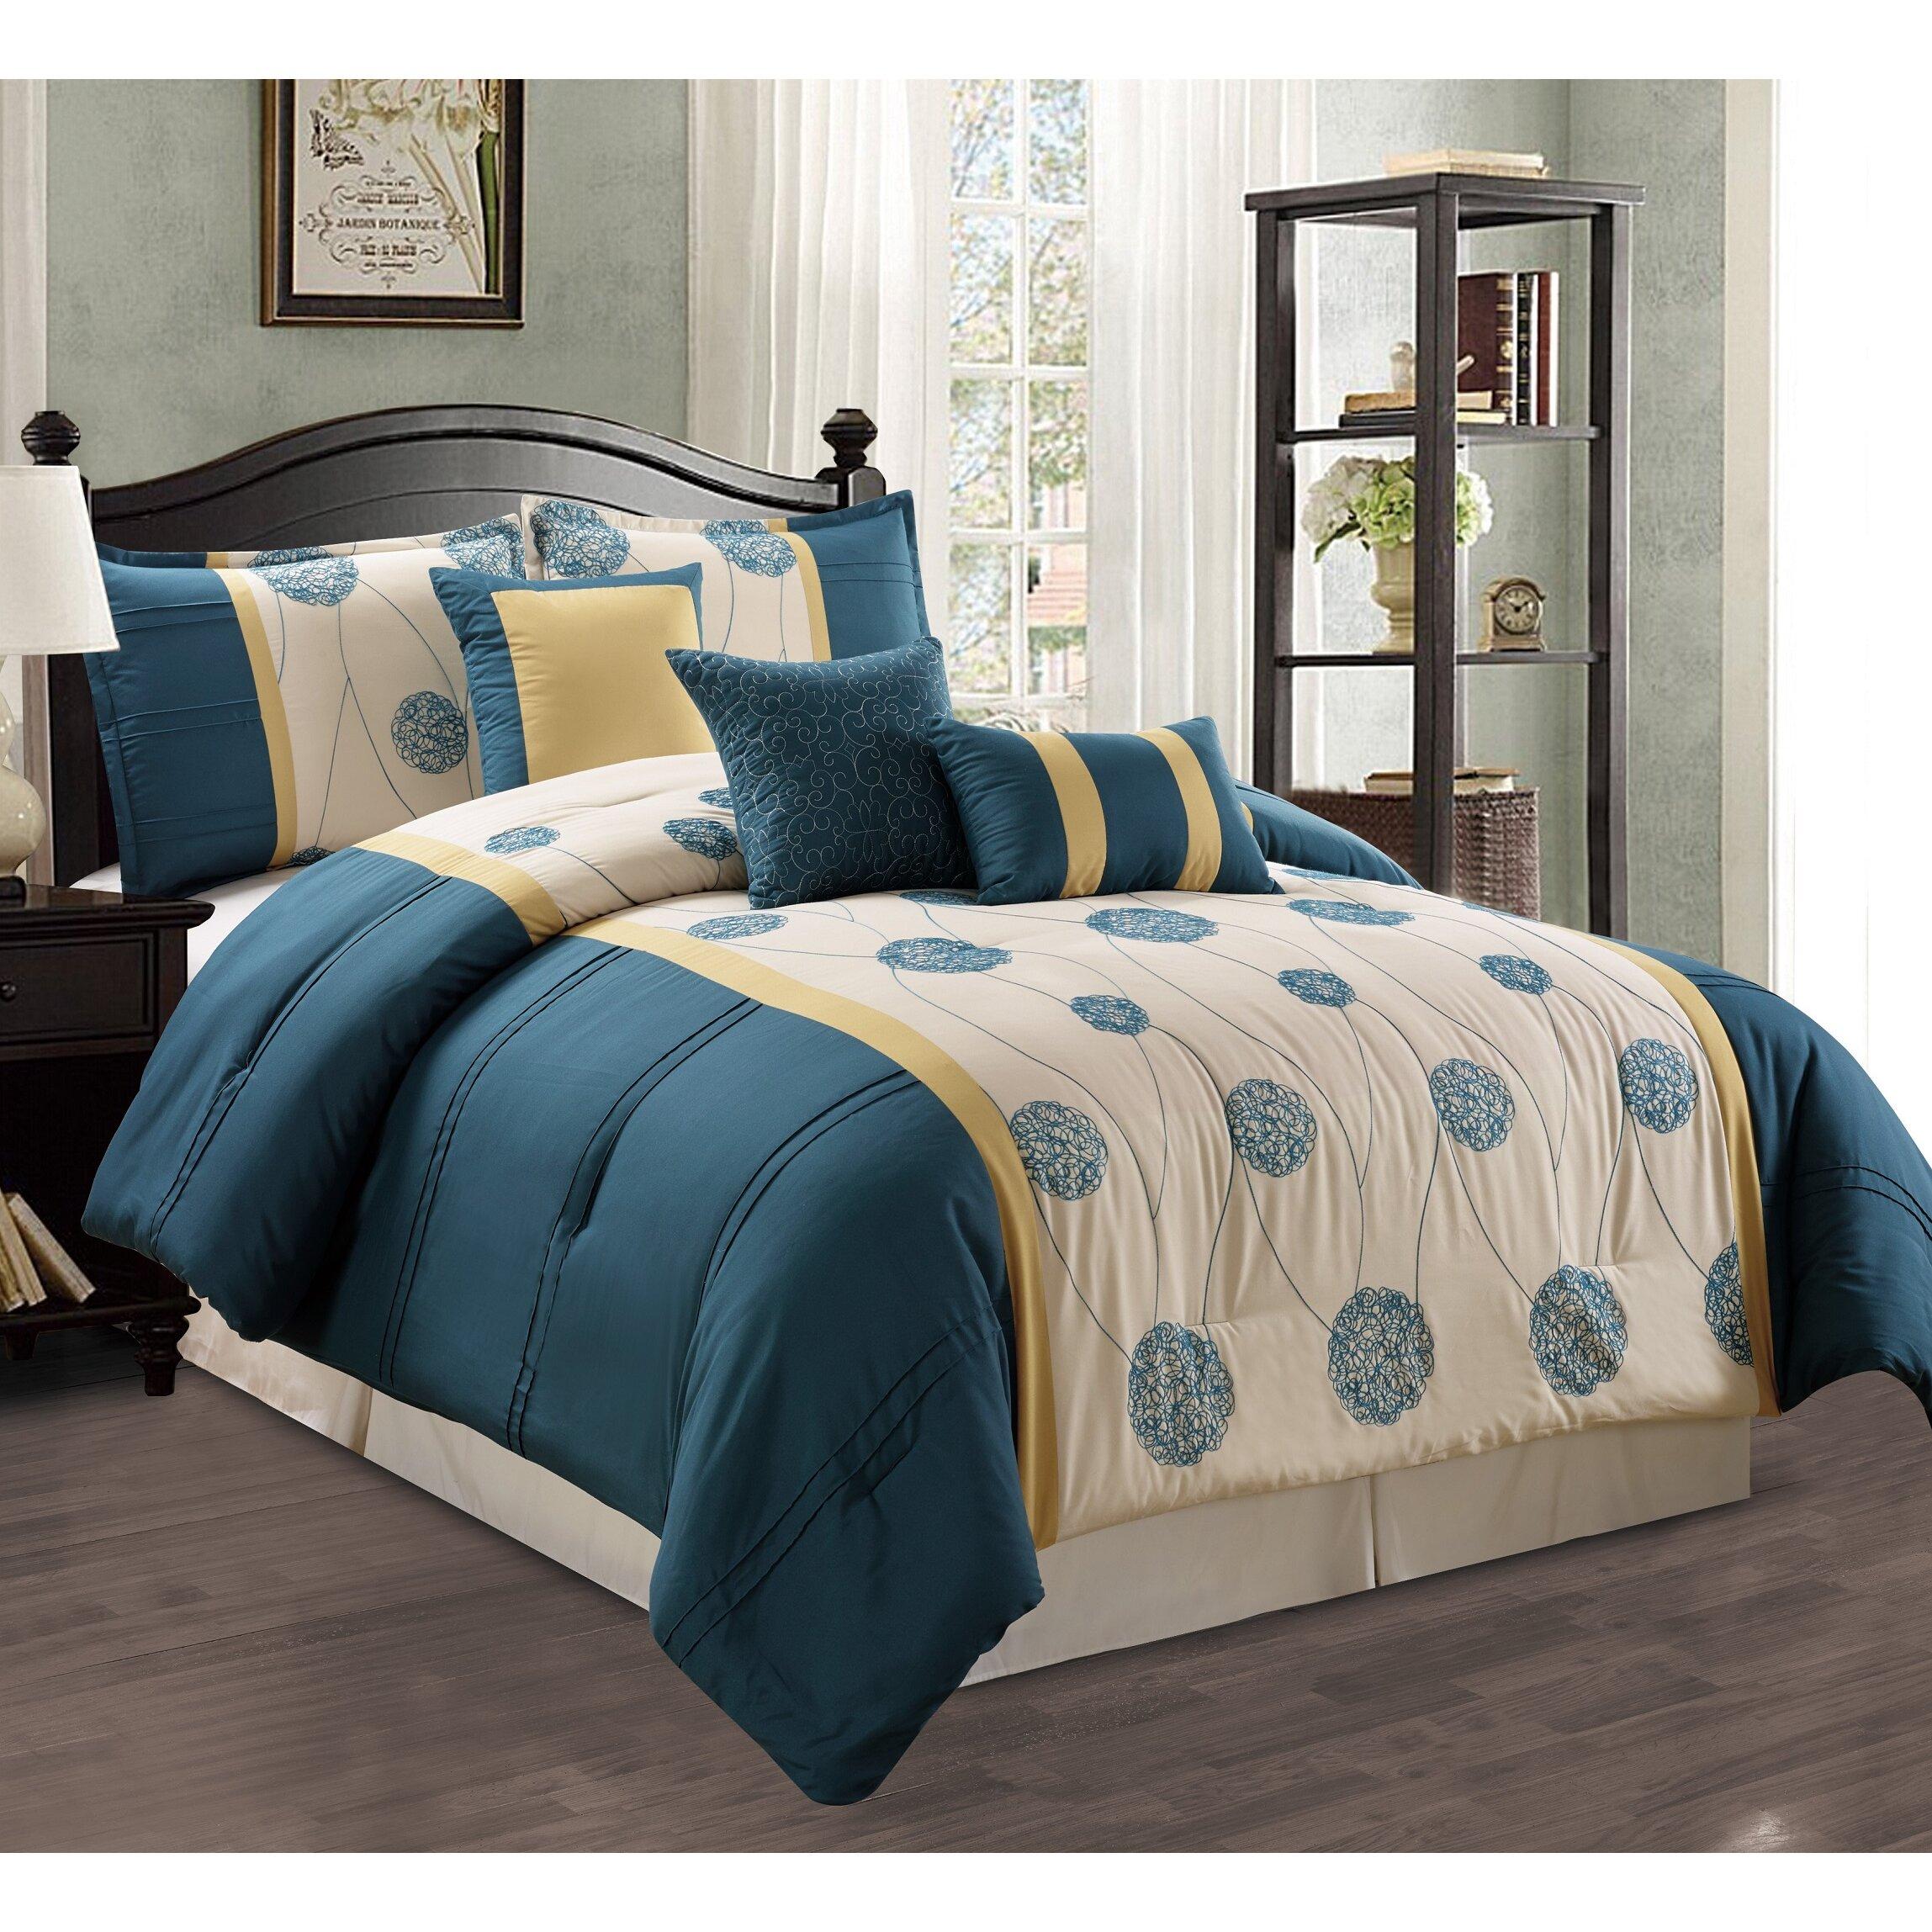 morgan home elizabeth 7 piece comforter set wayfair